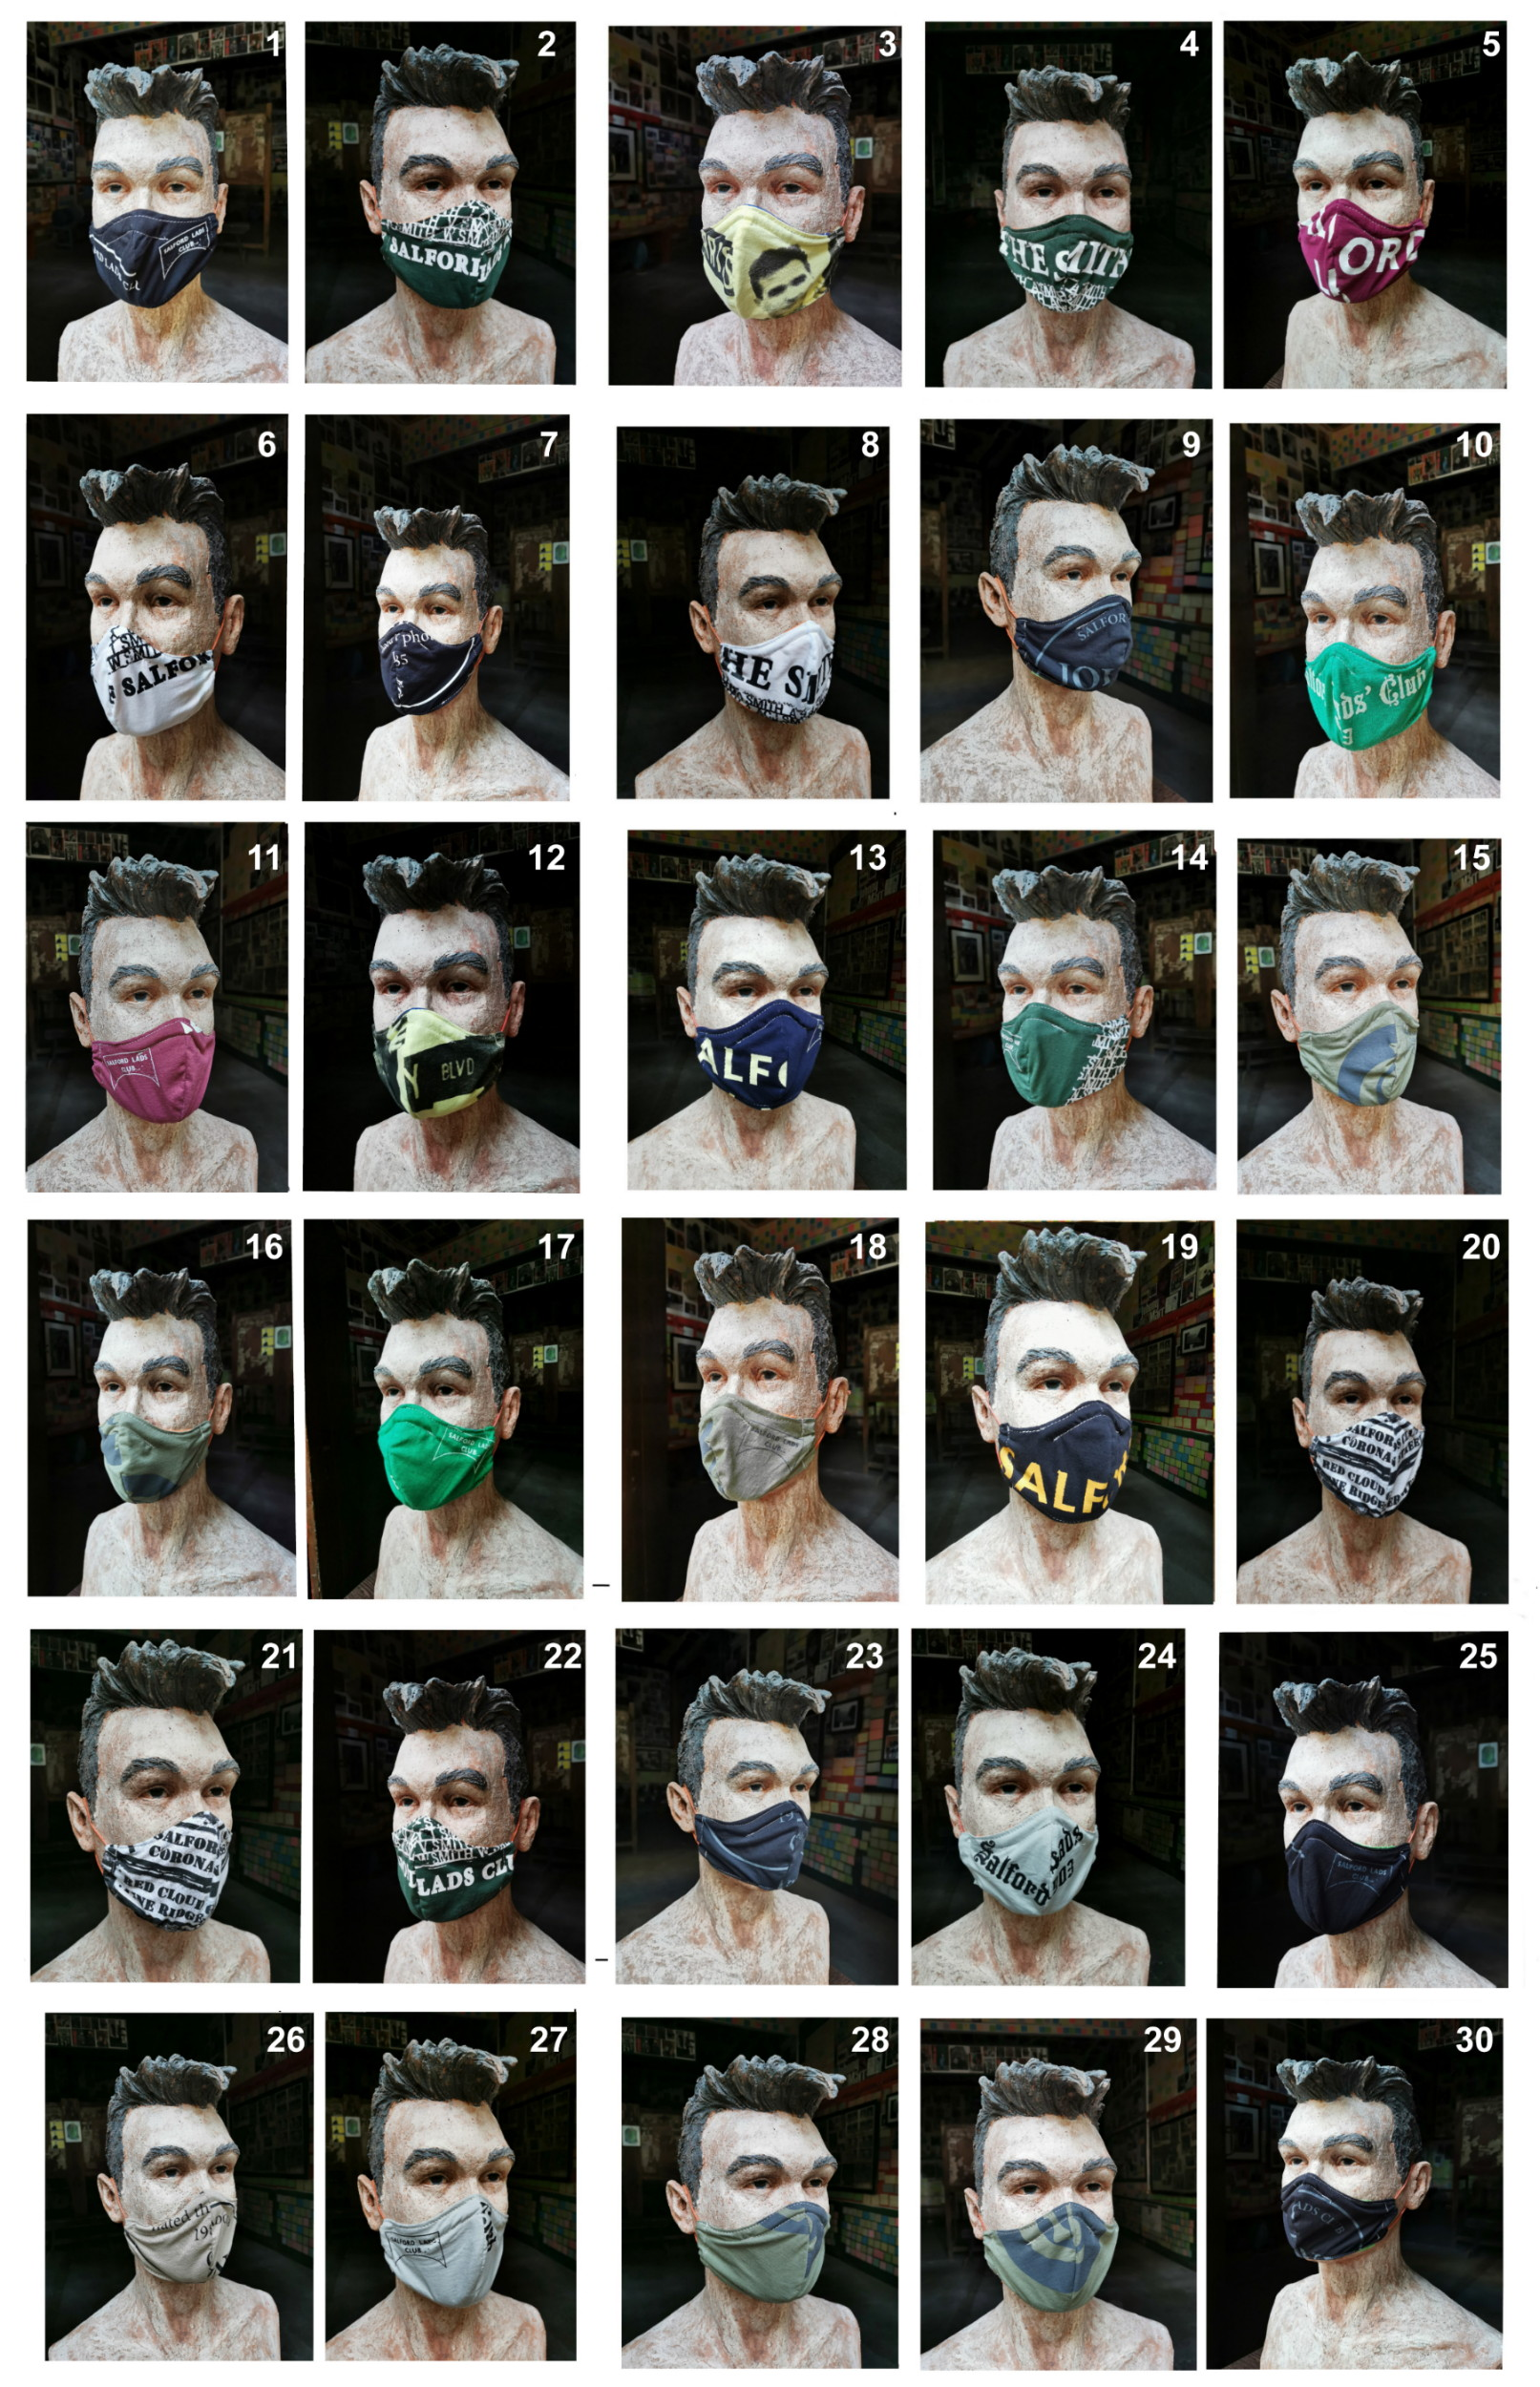 Mask me, Mask me, Mask me